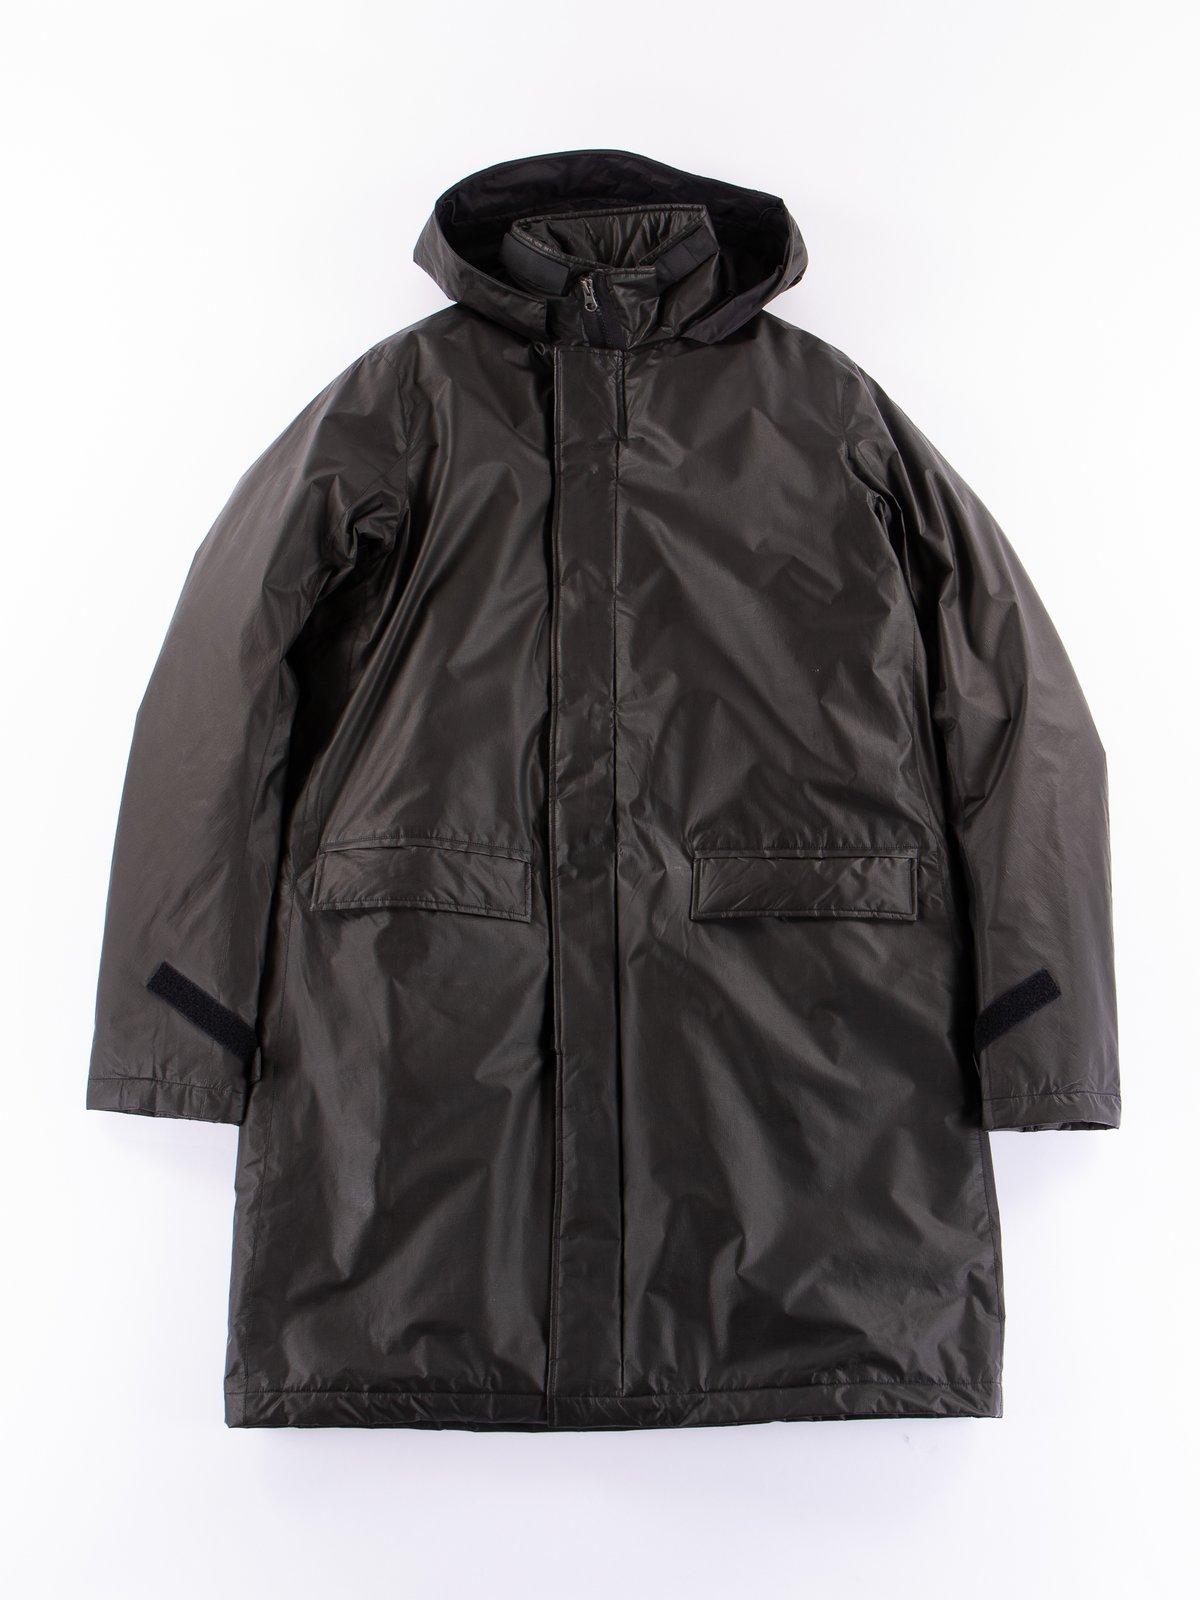 J46–FO 2L Gore–Tex Infinium Climashield Jacket - Image 1